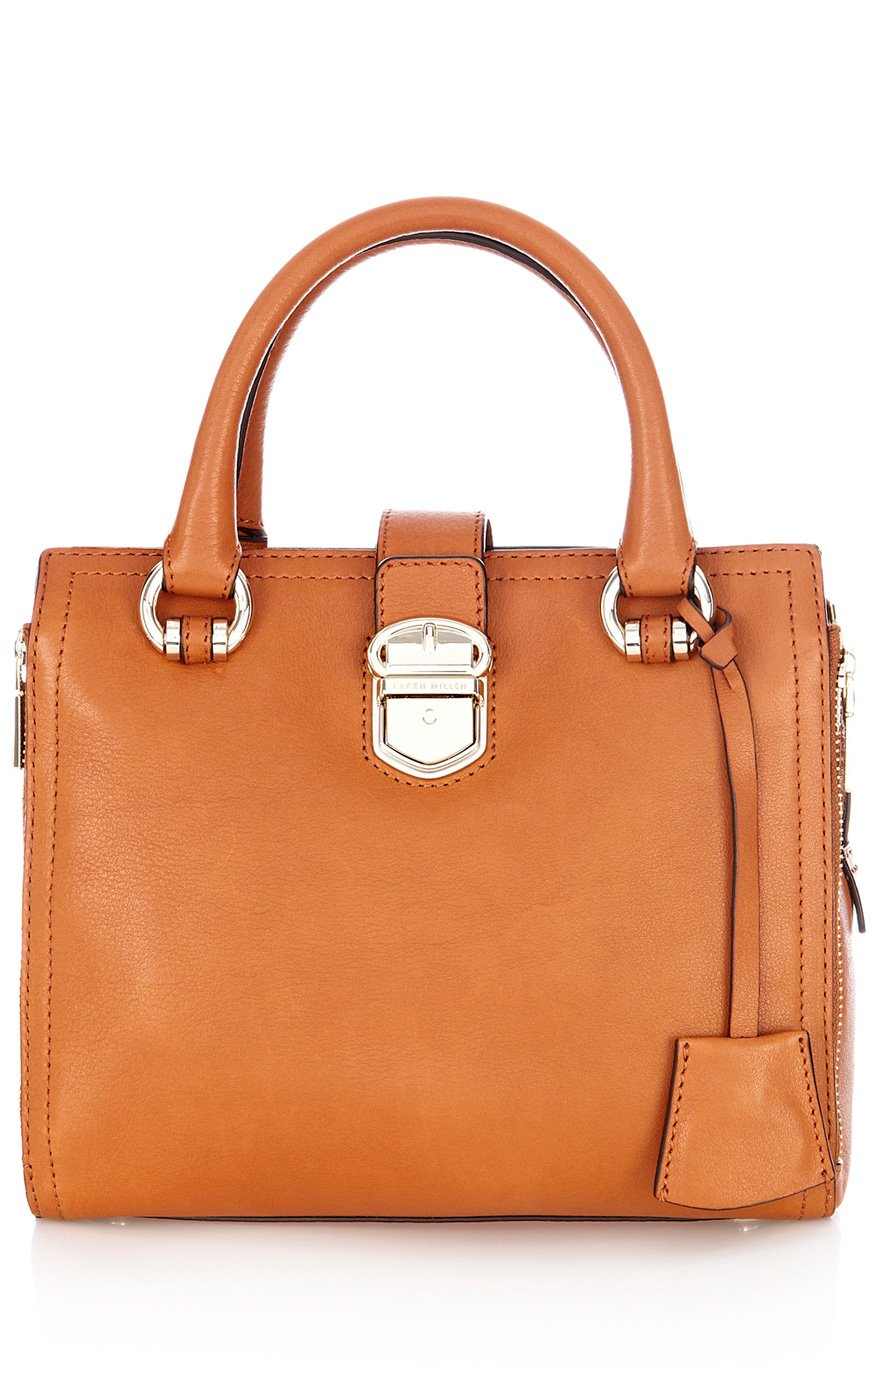 Lyst Karen Millen Tan Luxe Leather Mini Bag In Orange